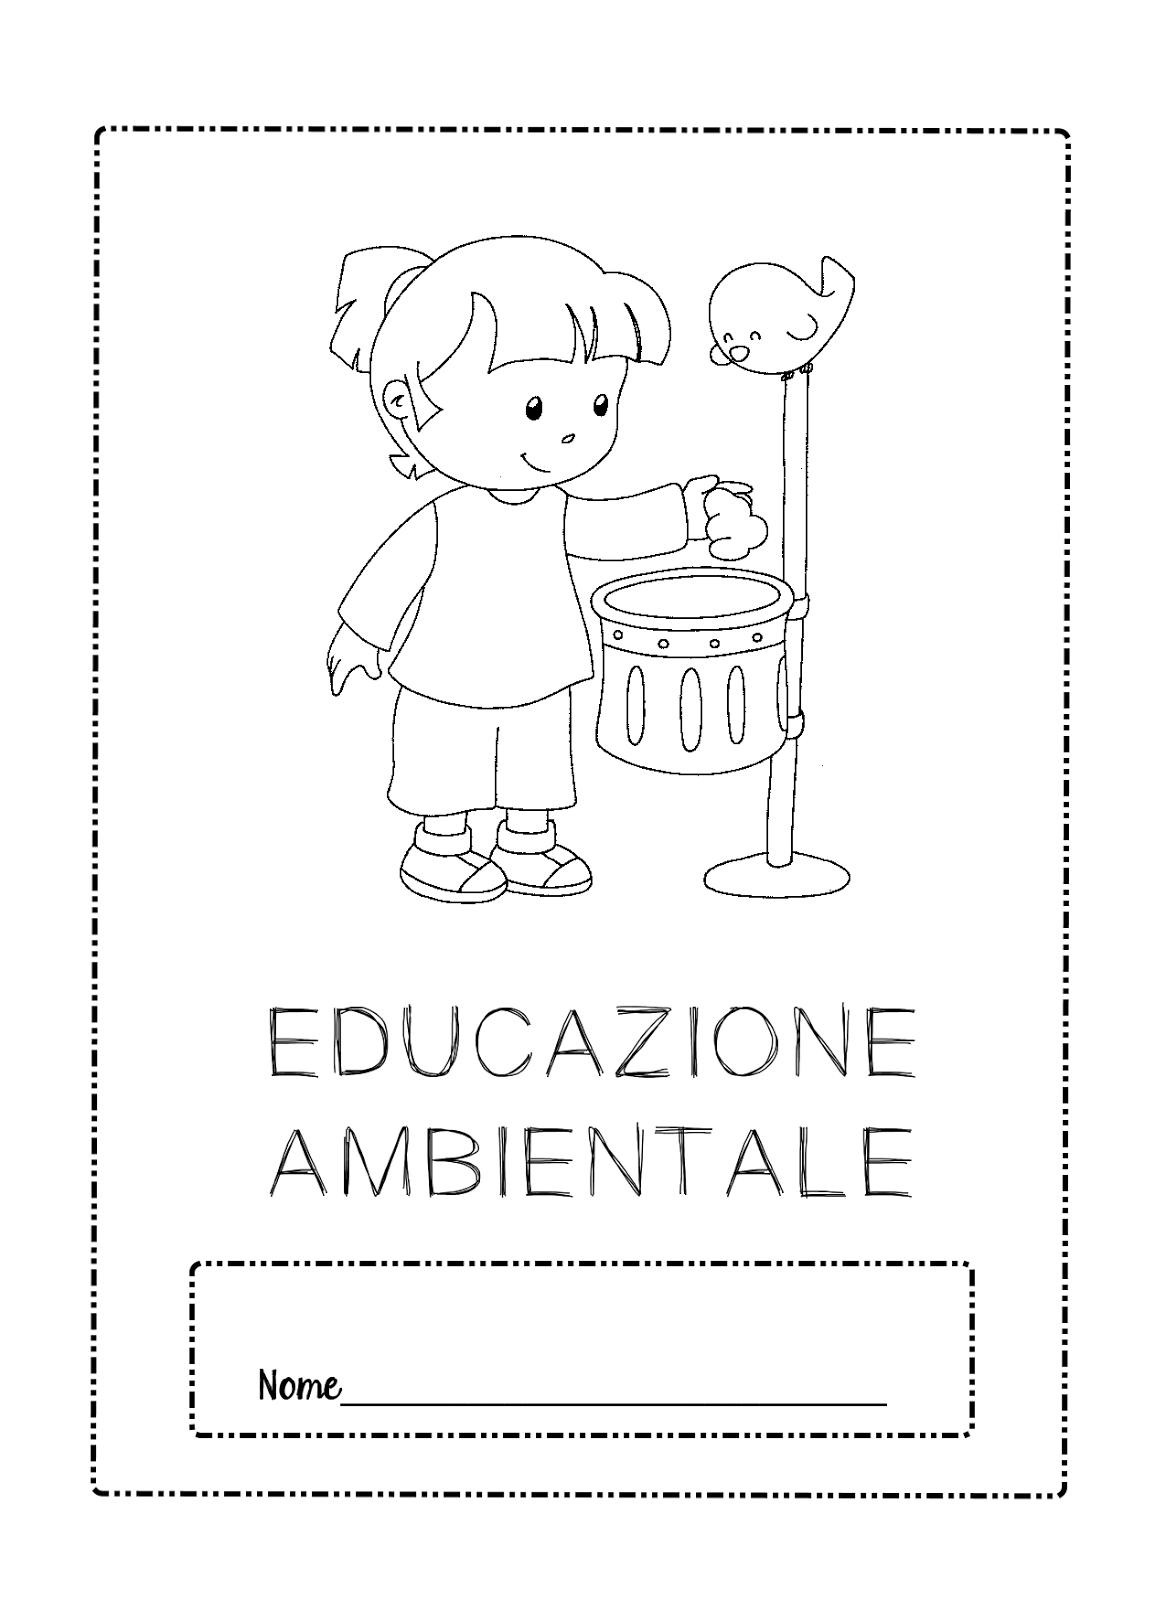 La Maestra Linda Educazione Ambientale Asilo School